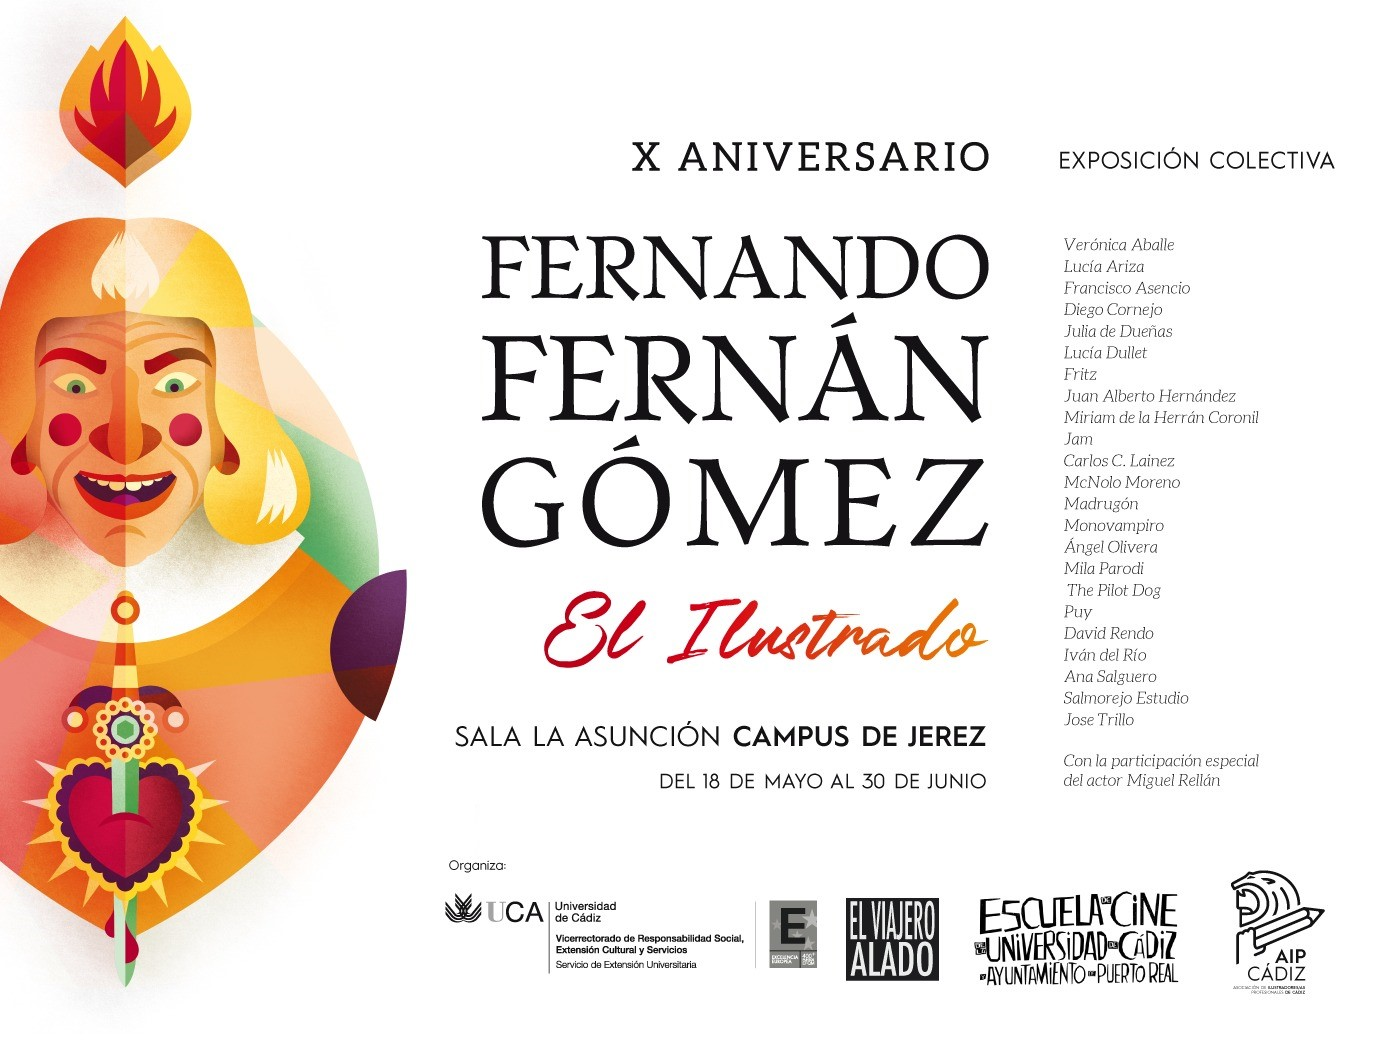 X Aniversario Fernando Fernán Gómez